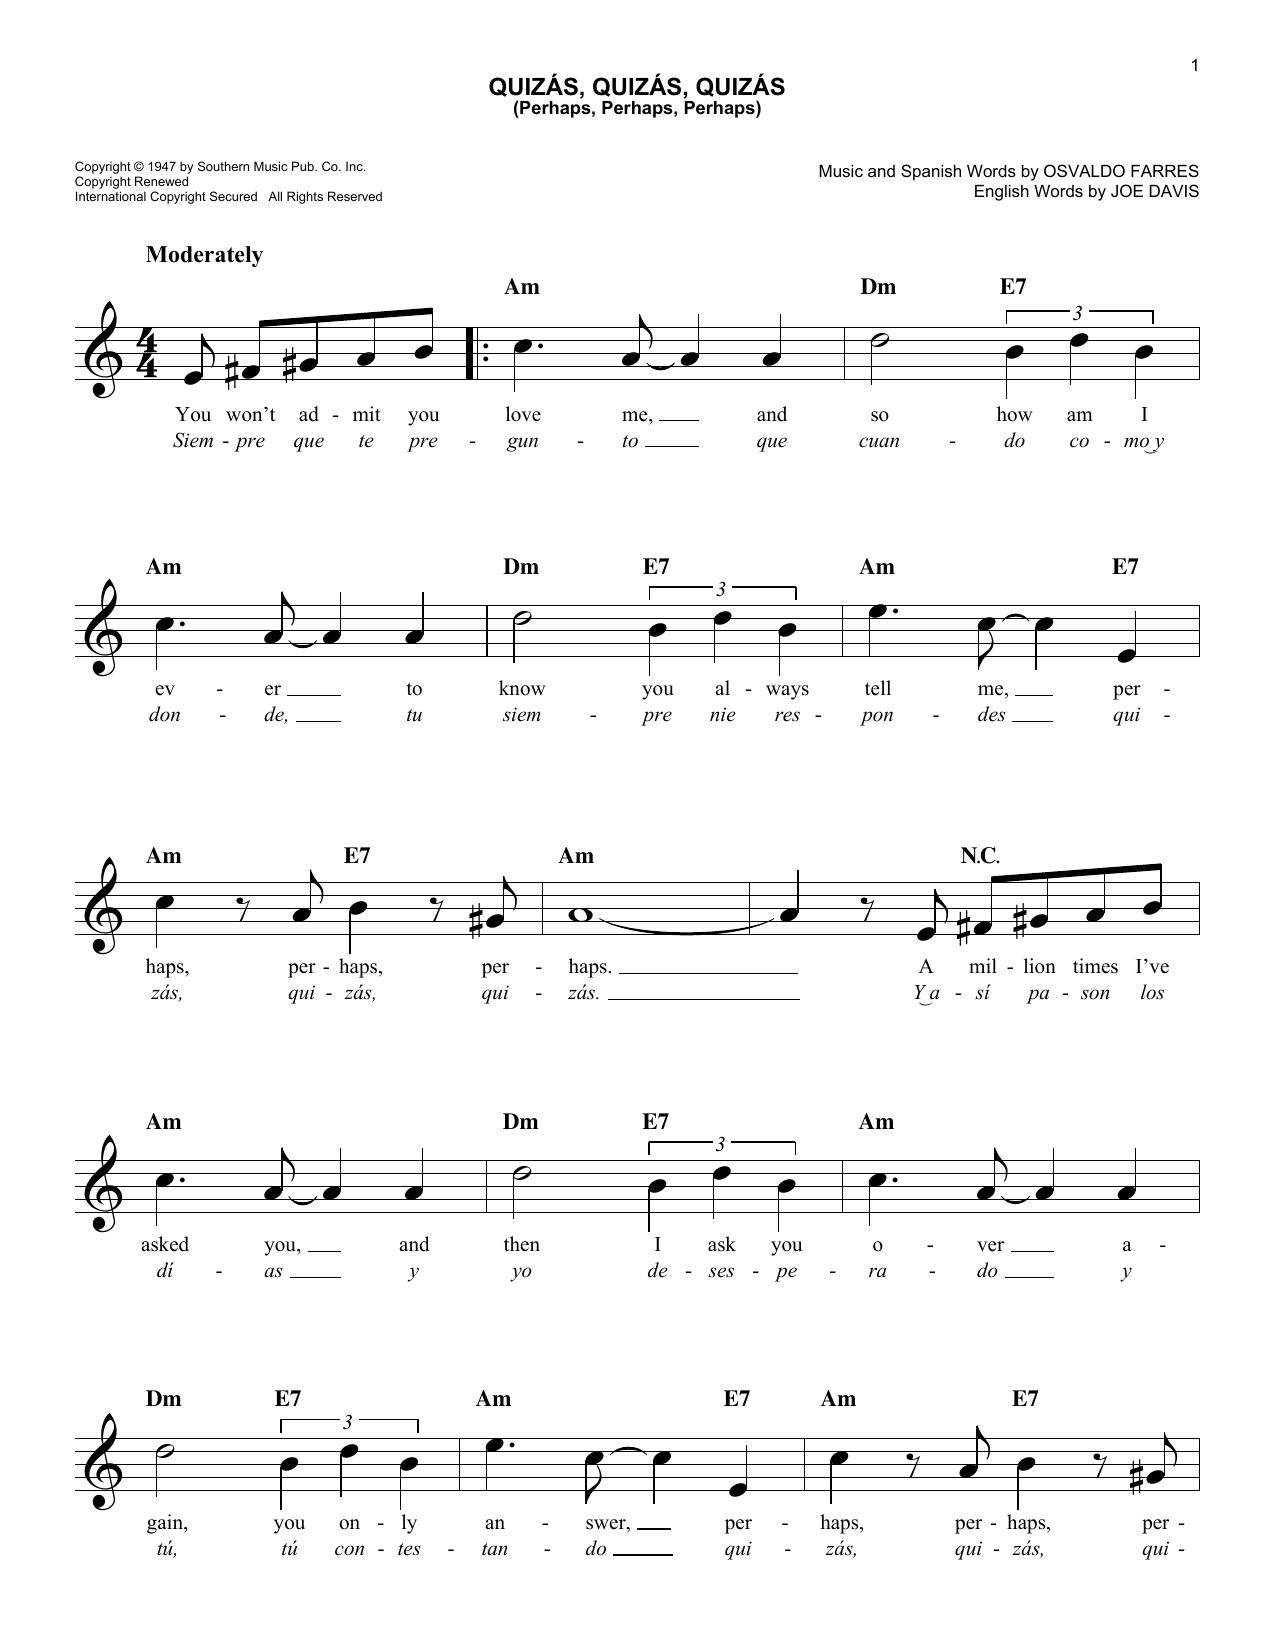 Quizás, Quizás, Quizás (Perhaps, Perhaps, Perhaps) Sheet Music